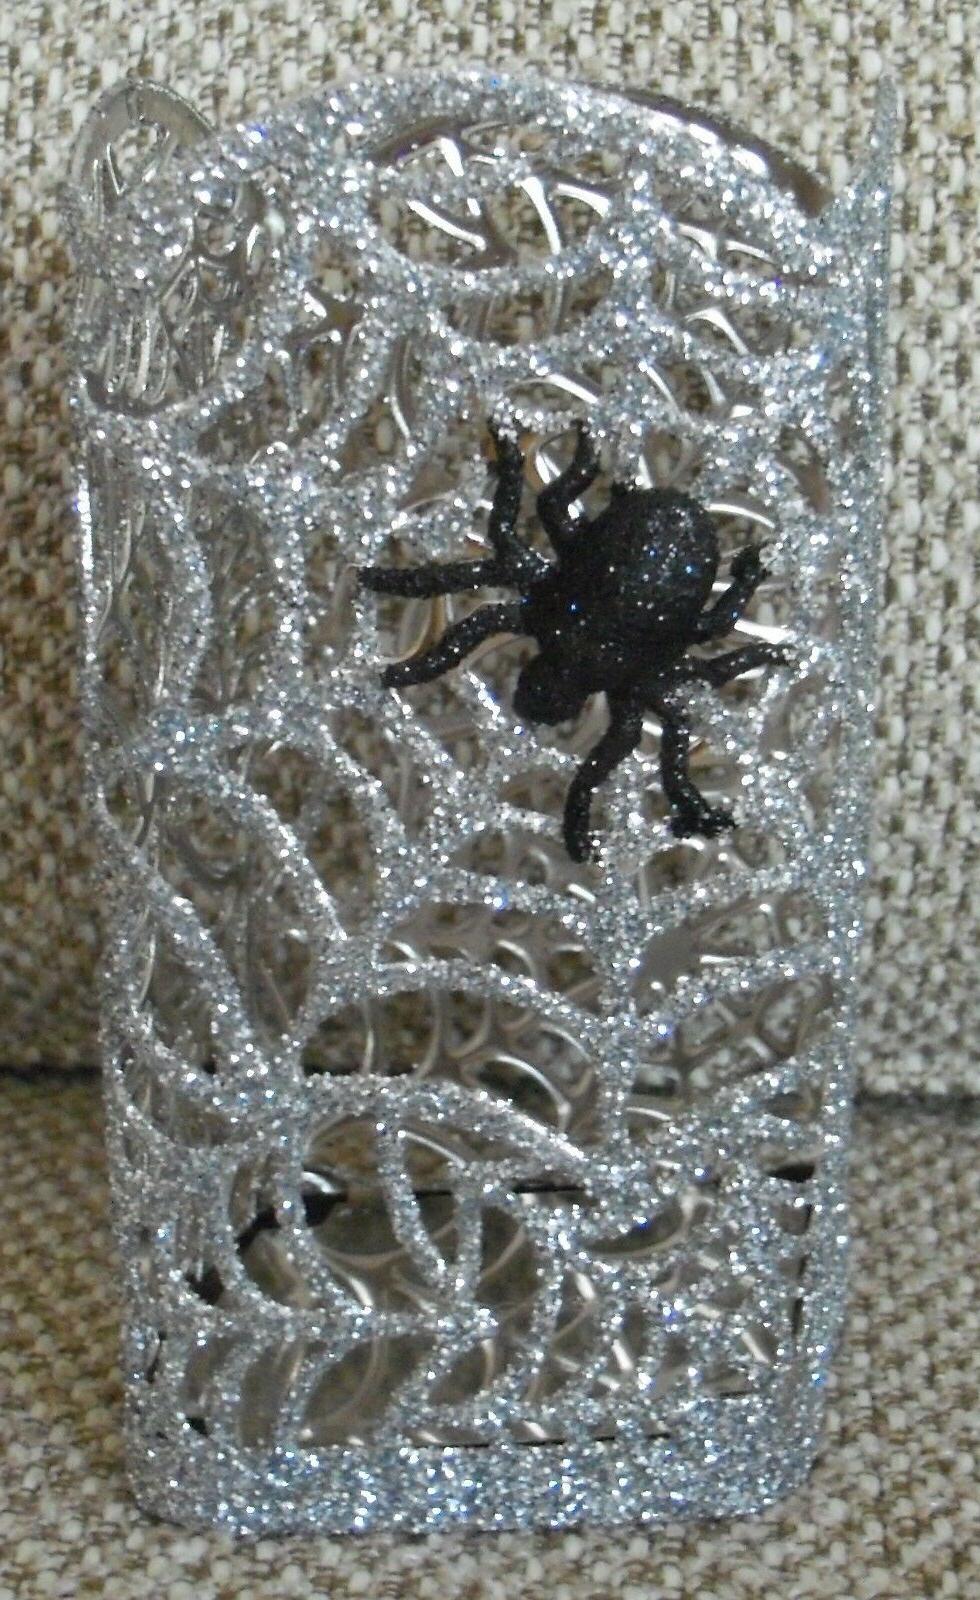 Bath & Body Works Spider Web Gentle Foaming Hand Soap Holder